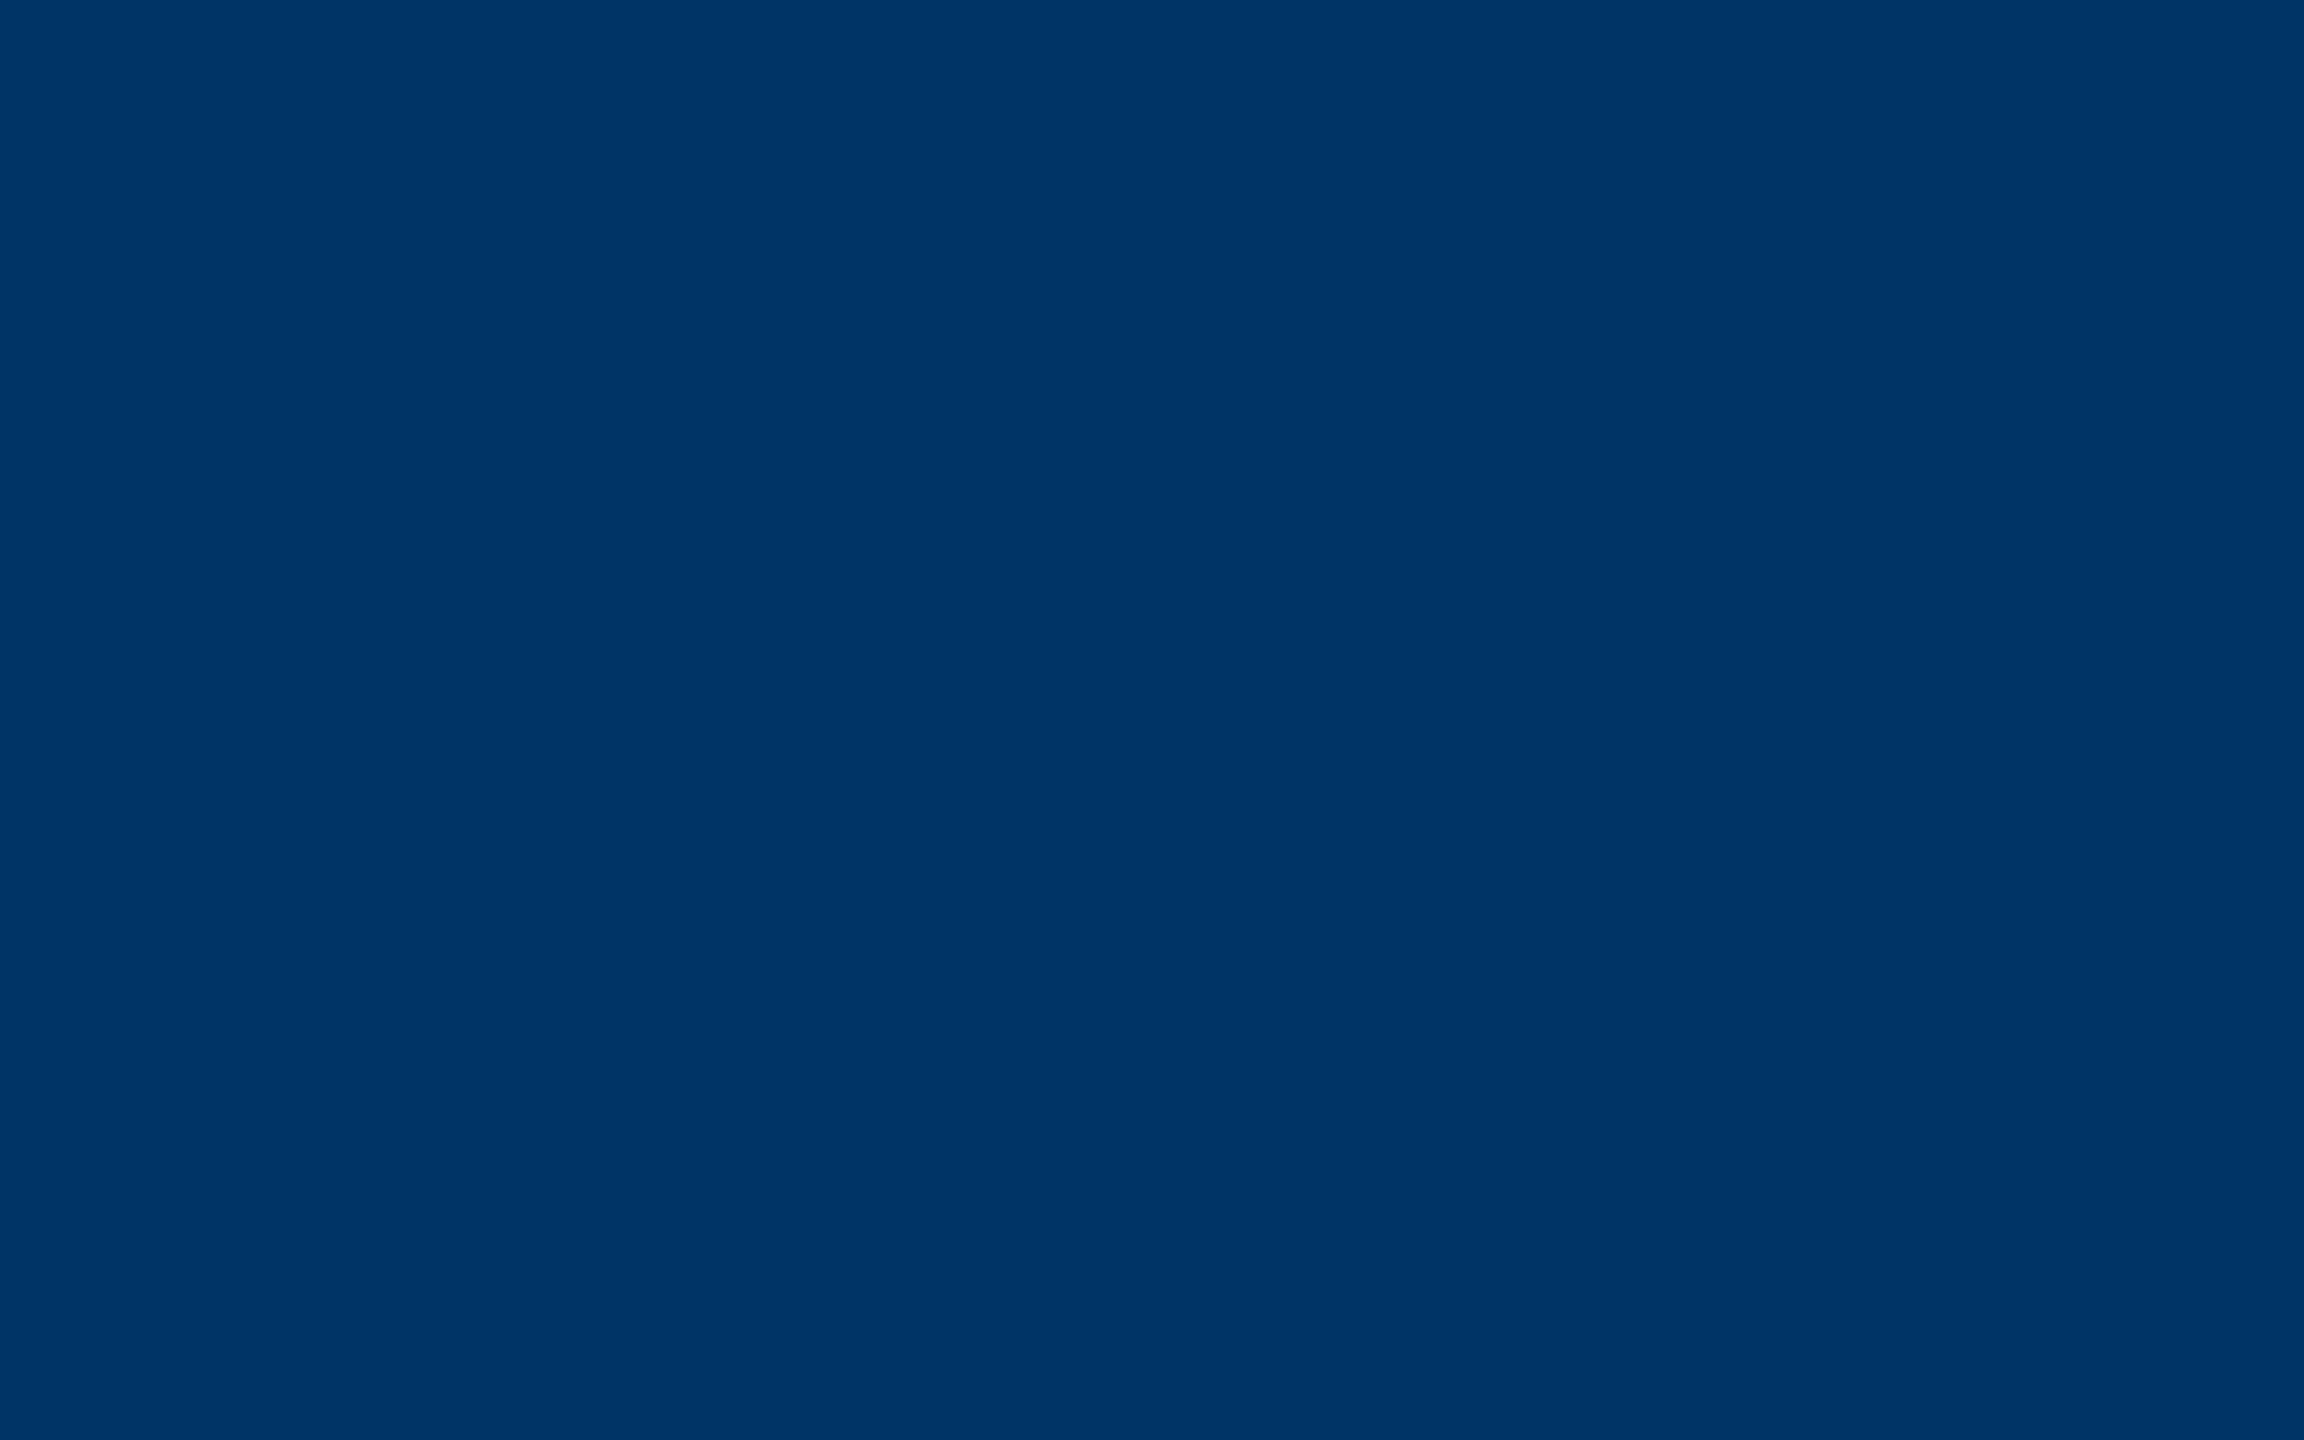 2304x1440 Dark Midnight Blue Solid Color Background